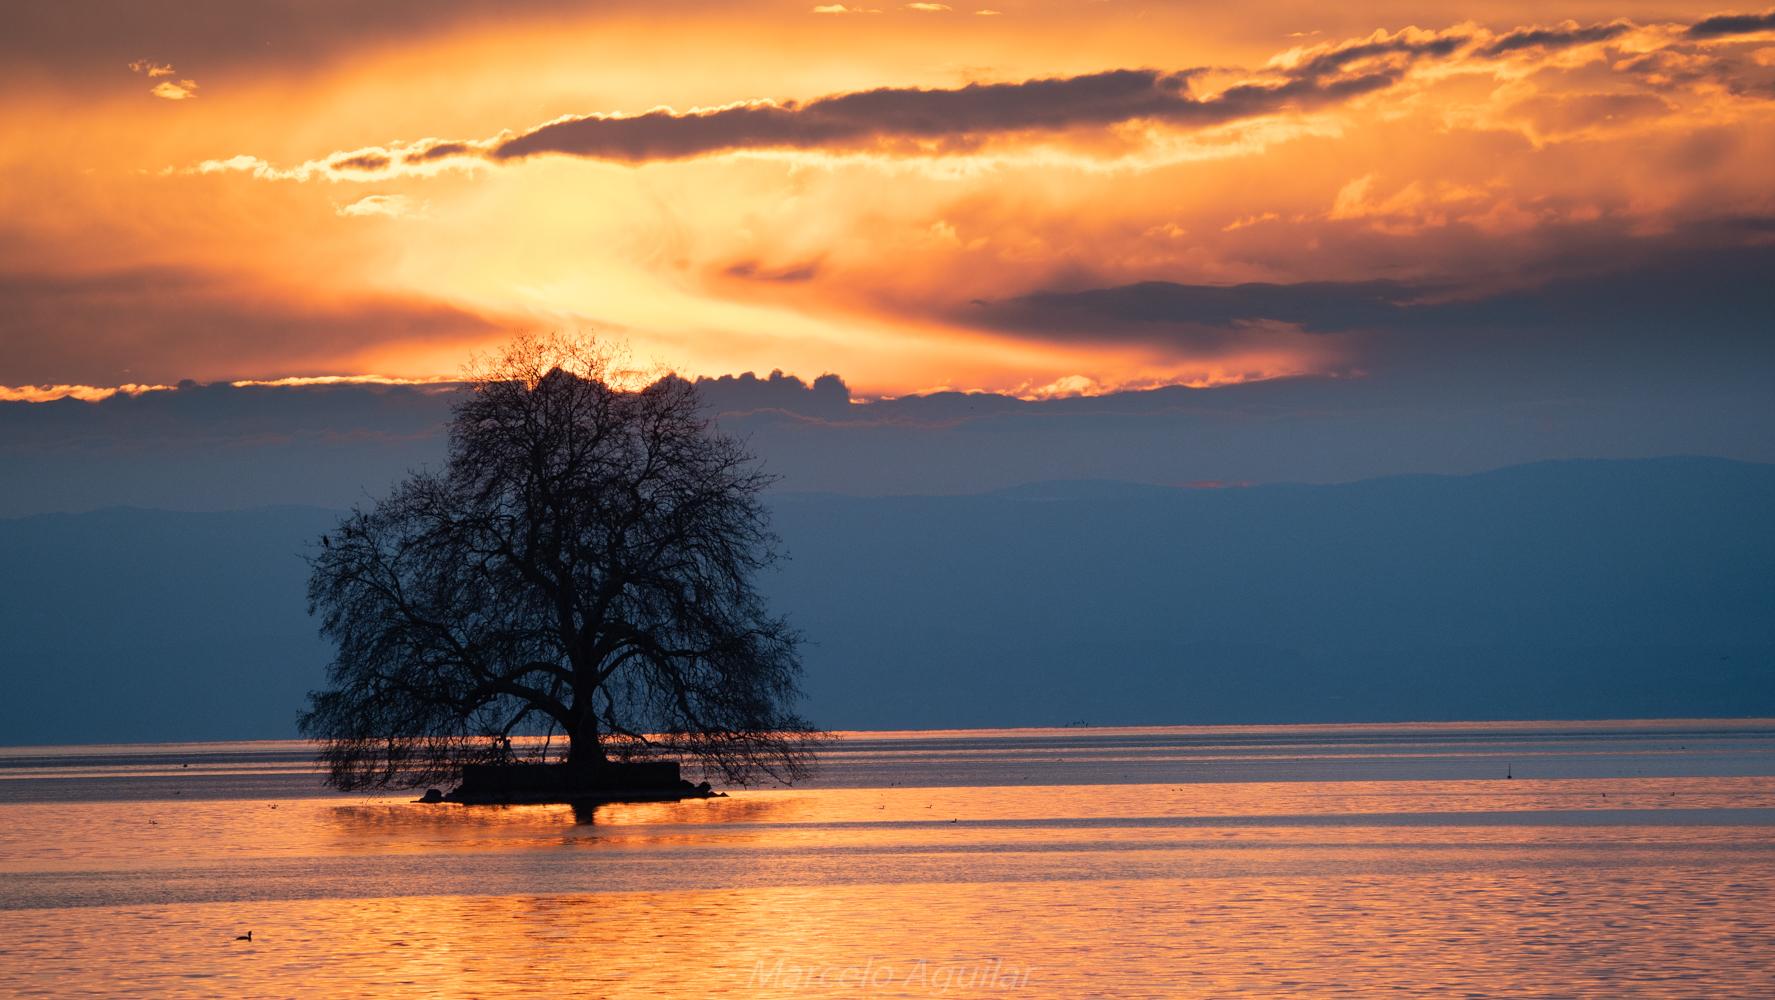 Solitary tree in Villeneuve, Switzerland